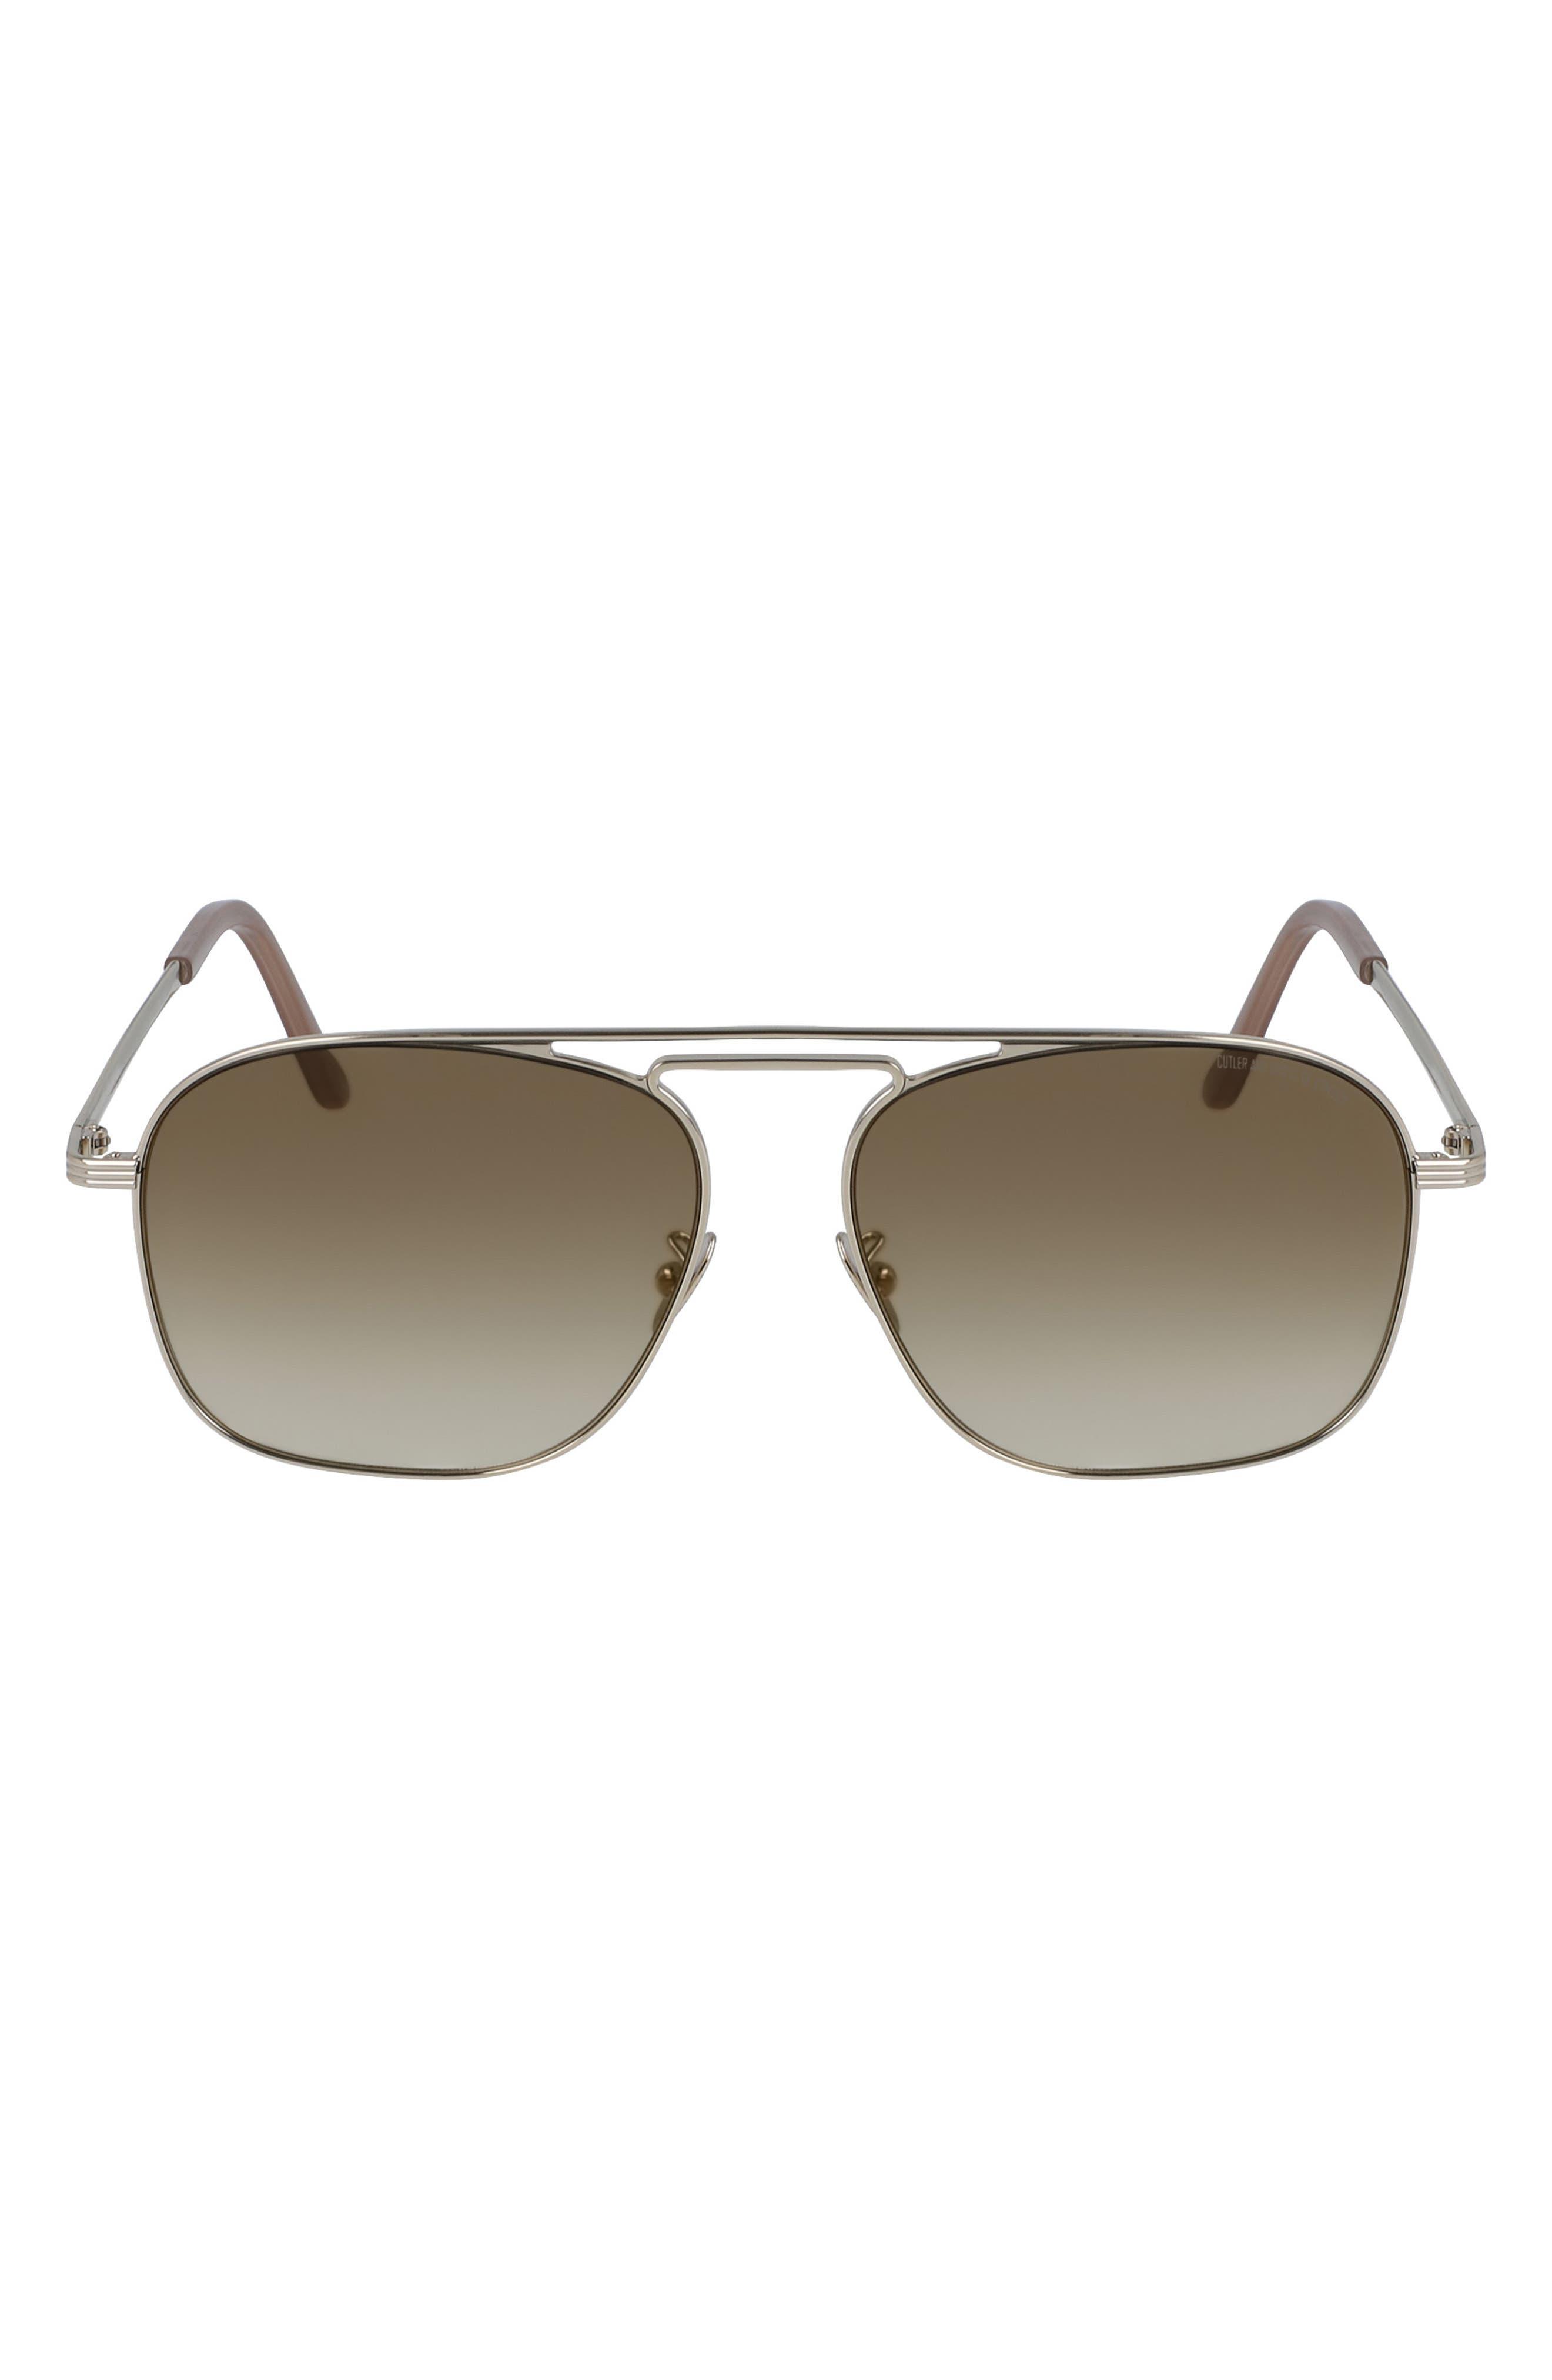 56mm Aviator Sunglasses